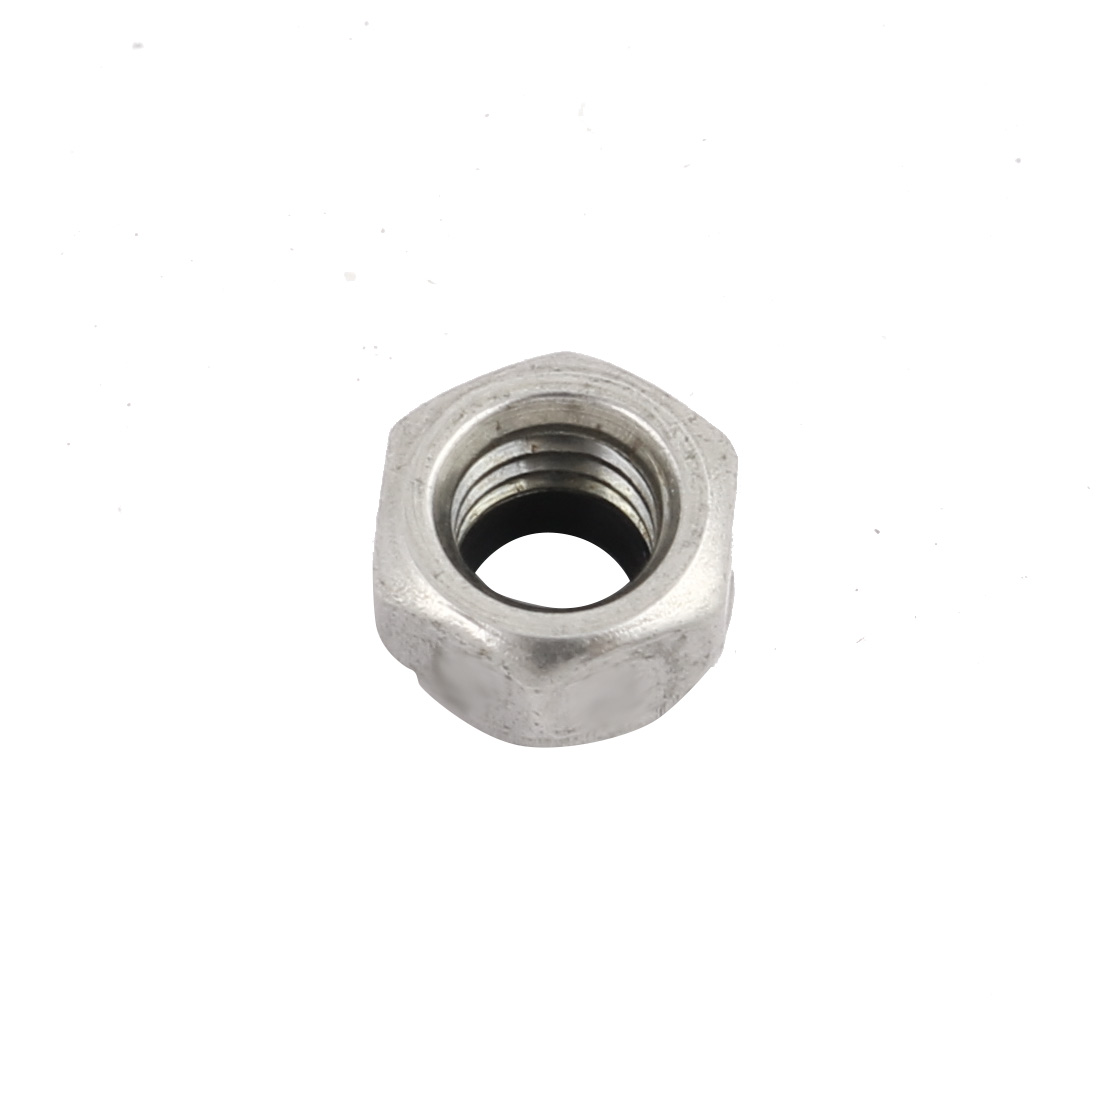 Mechanical Fastener Stainless Steel Self-locking Nylon Insert Lock Hex Nut M5 Thread Dia